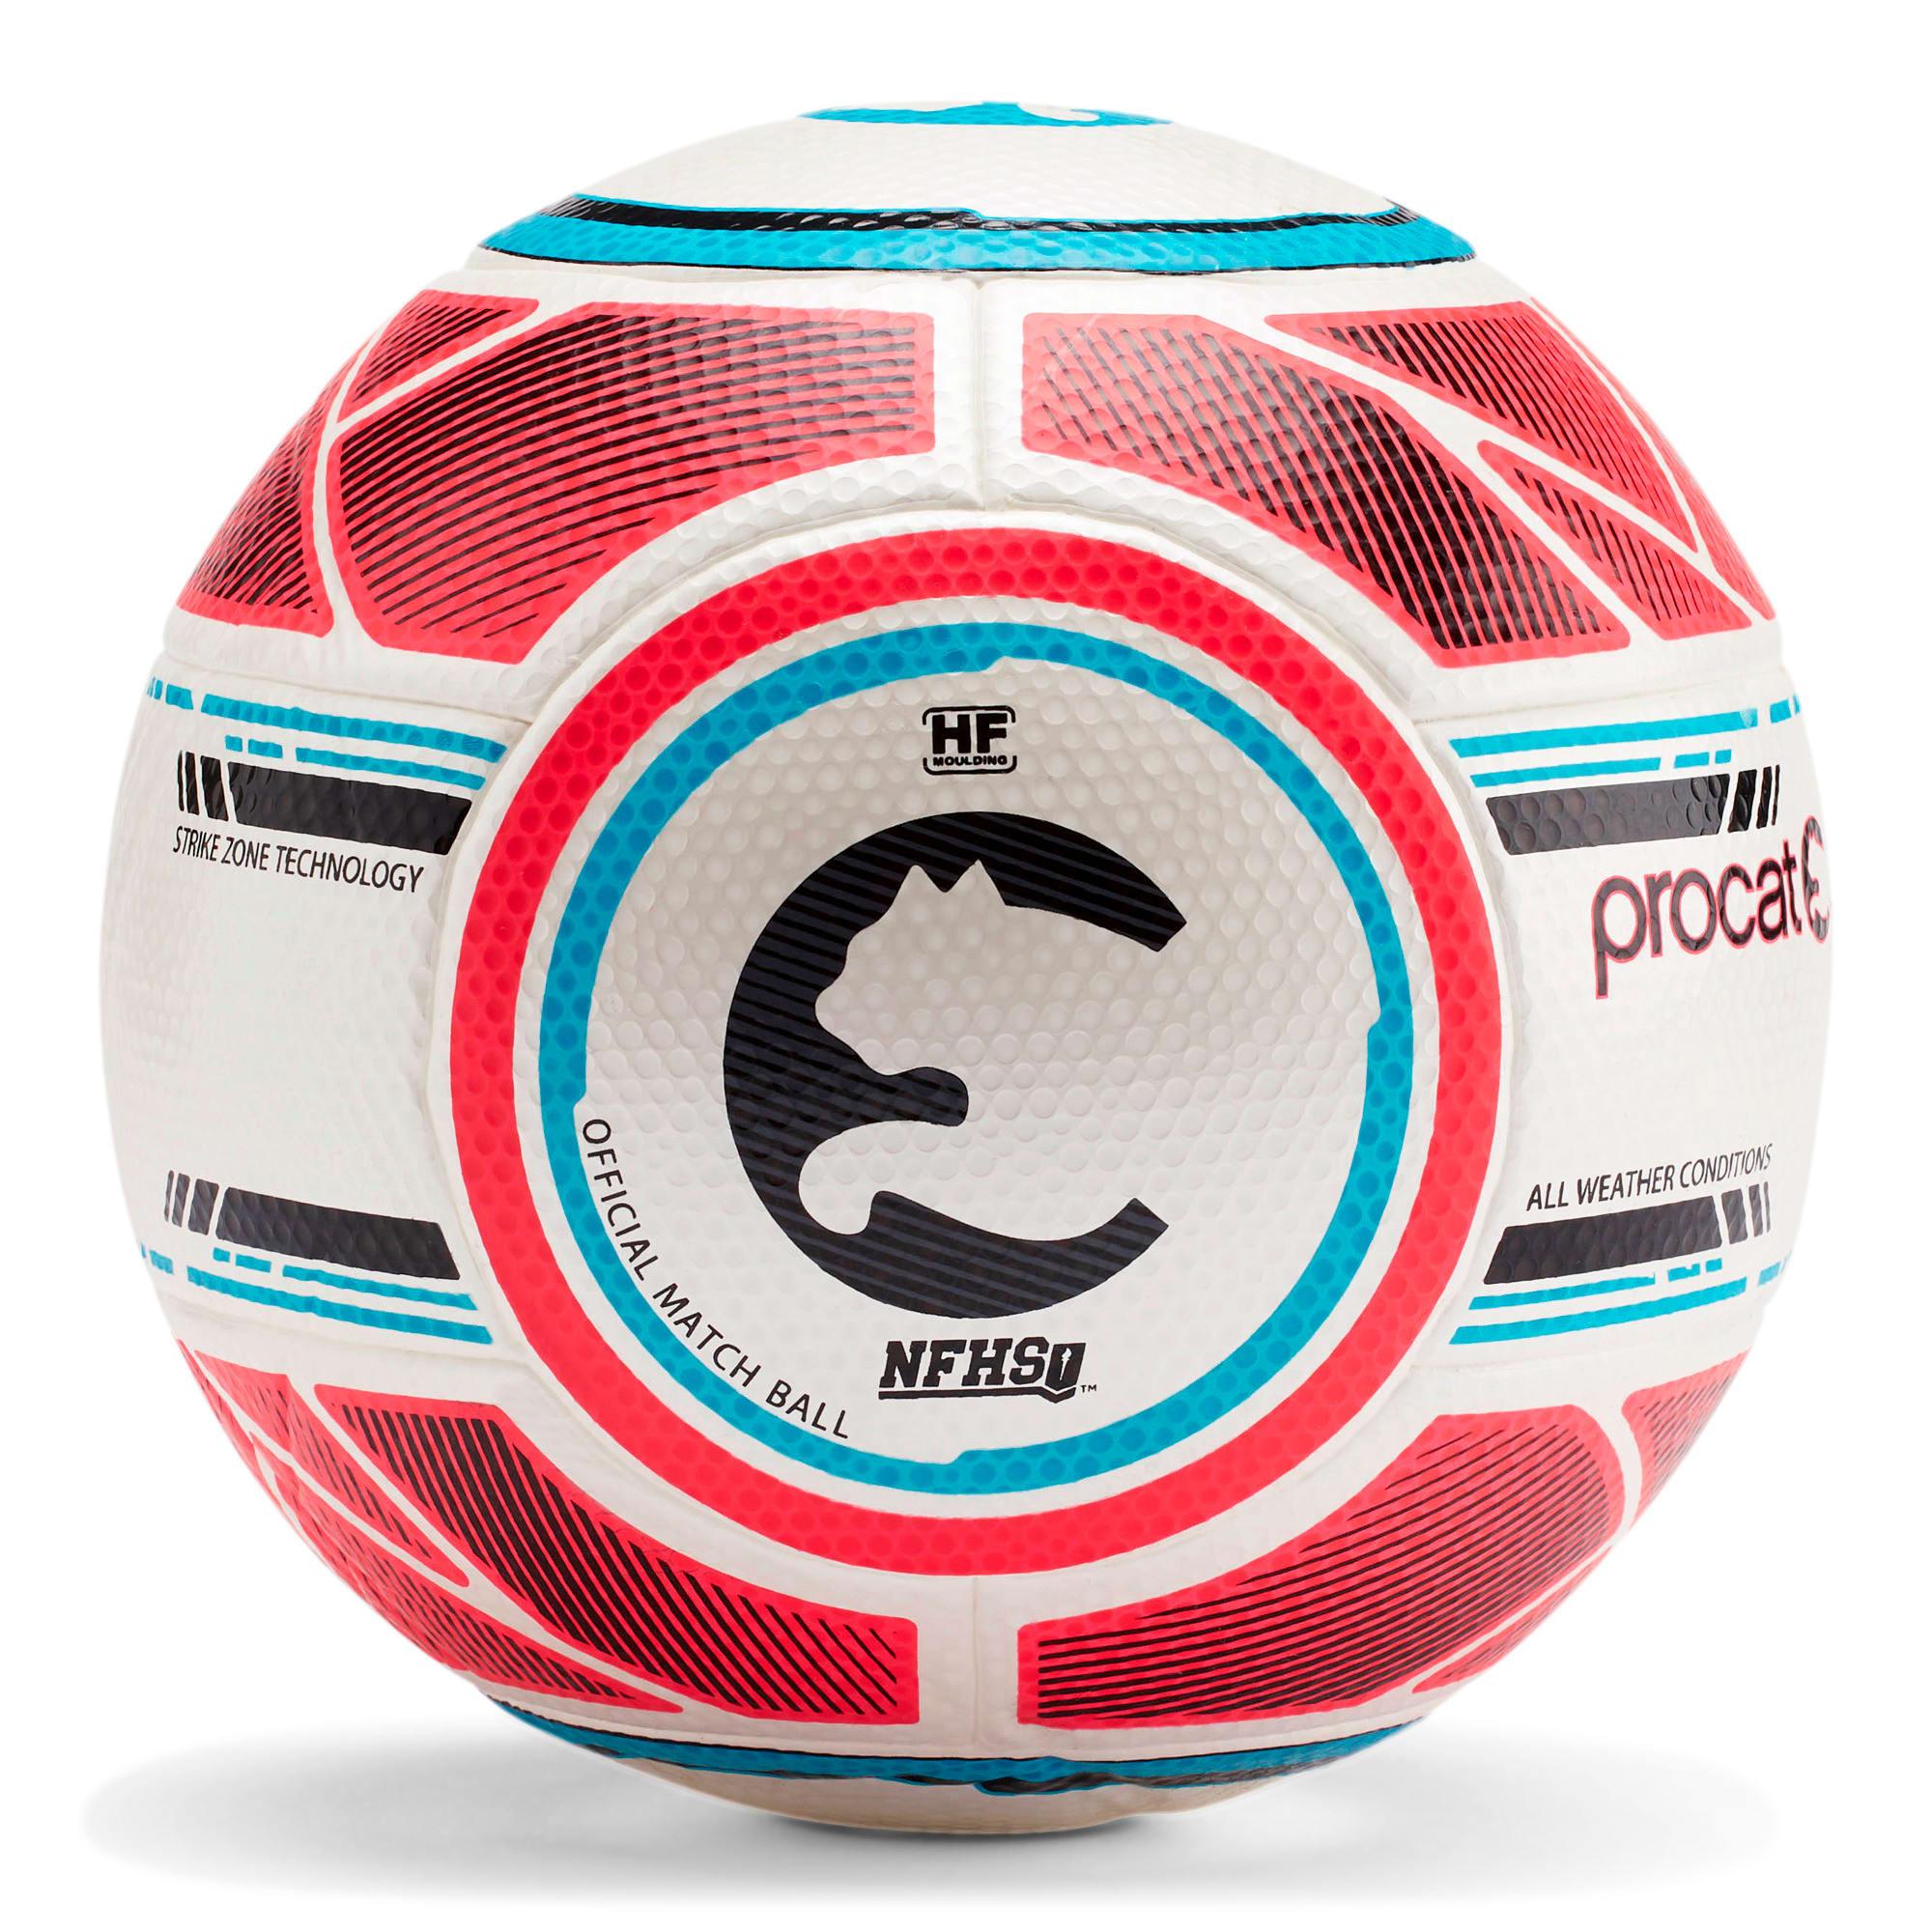 Thumbnail 1 of ProCat ProComp Soccer Ball, CORAL, medium